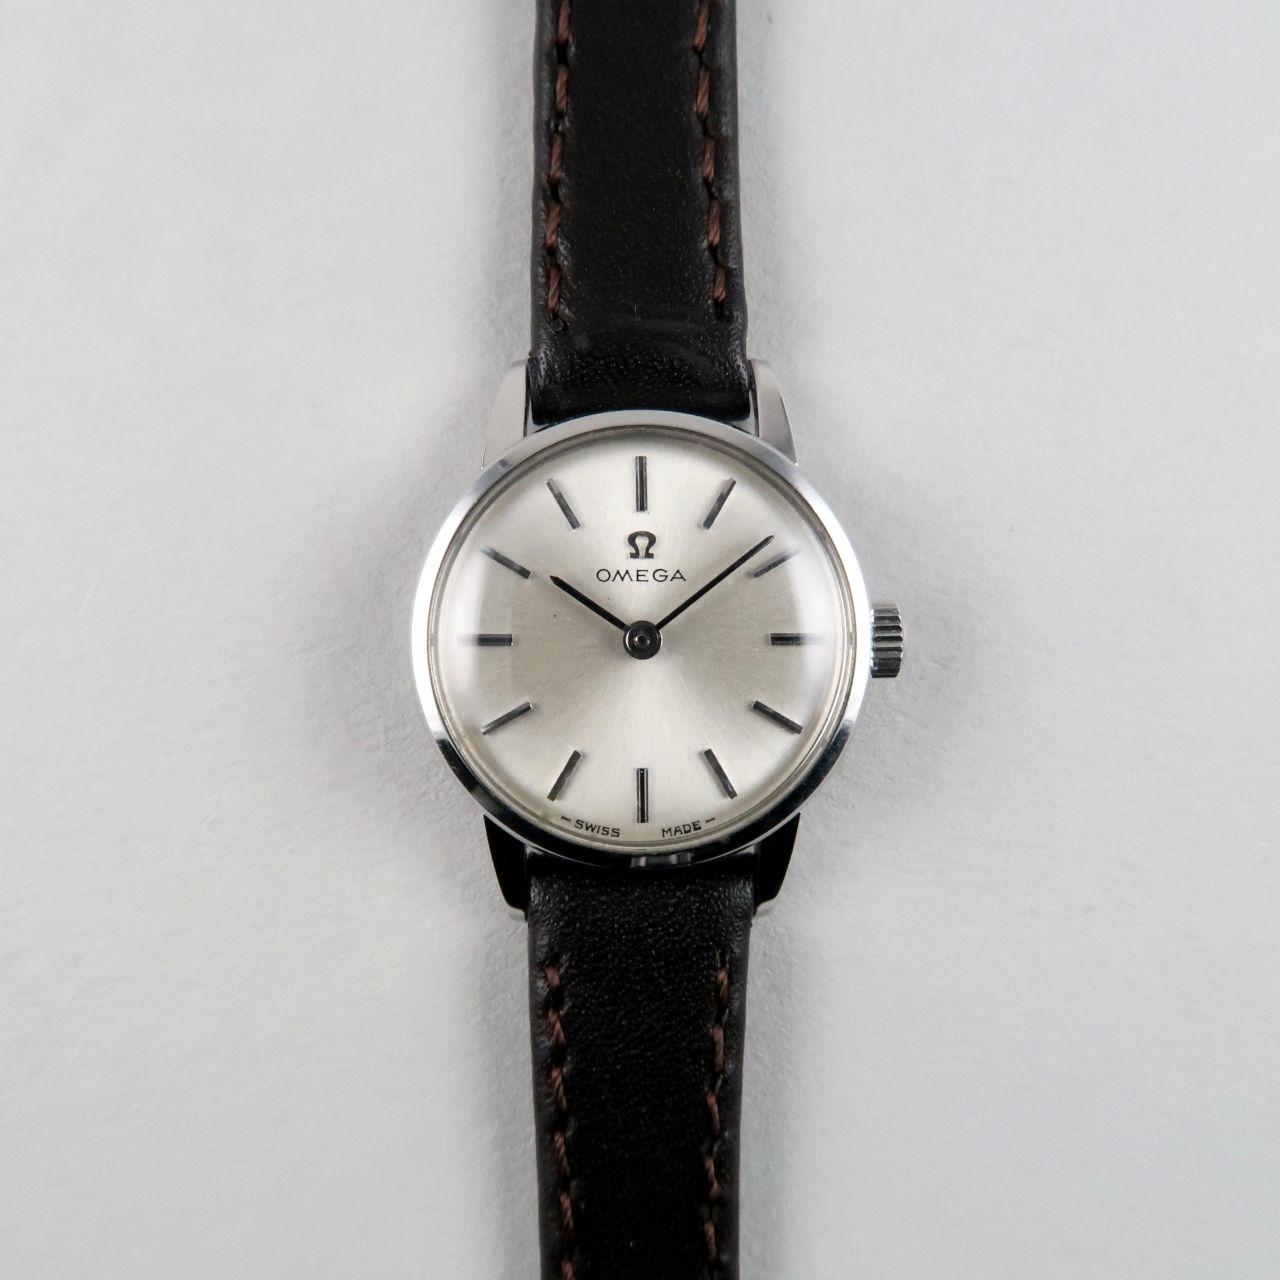 Omega Ref. 511.015 lady's steel vintage wristwatch, circa 1965